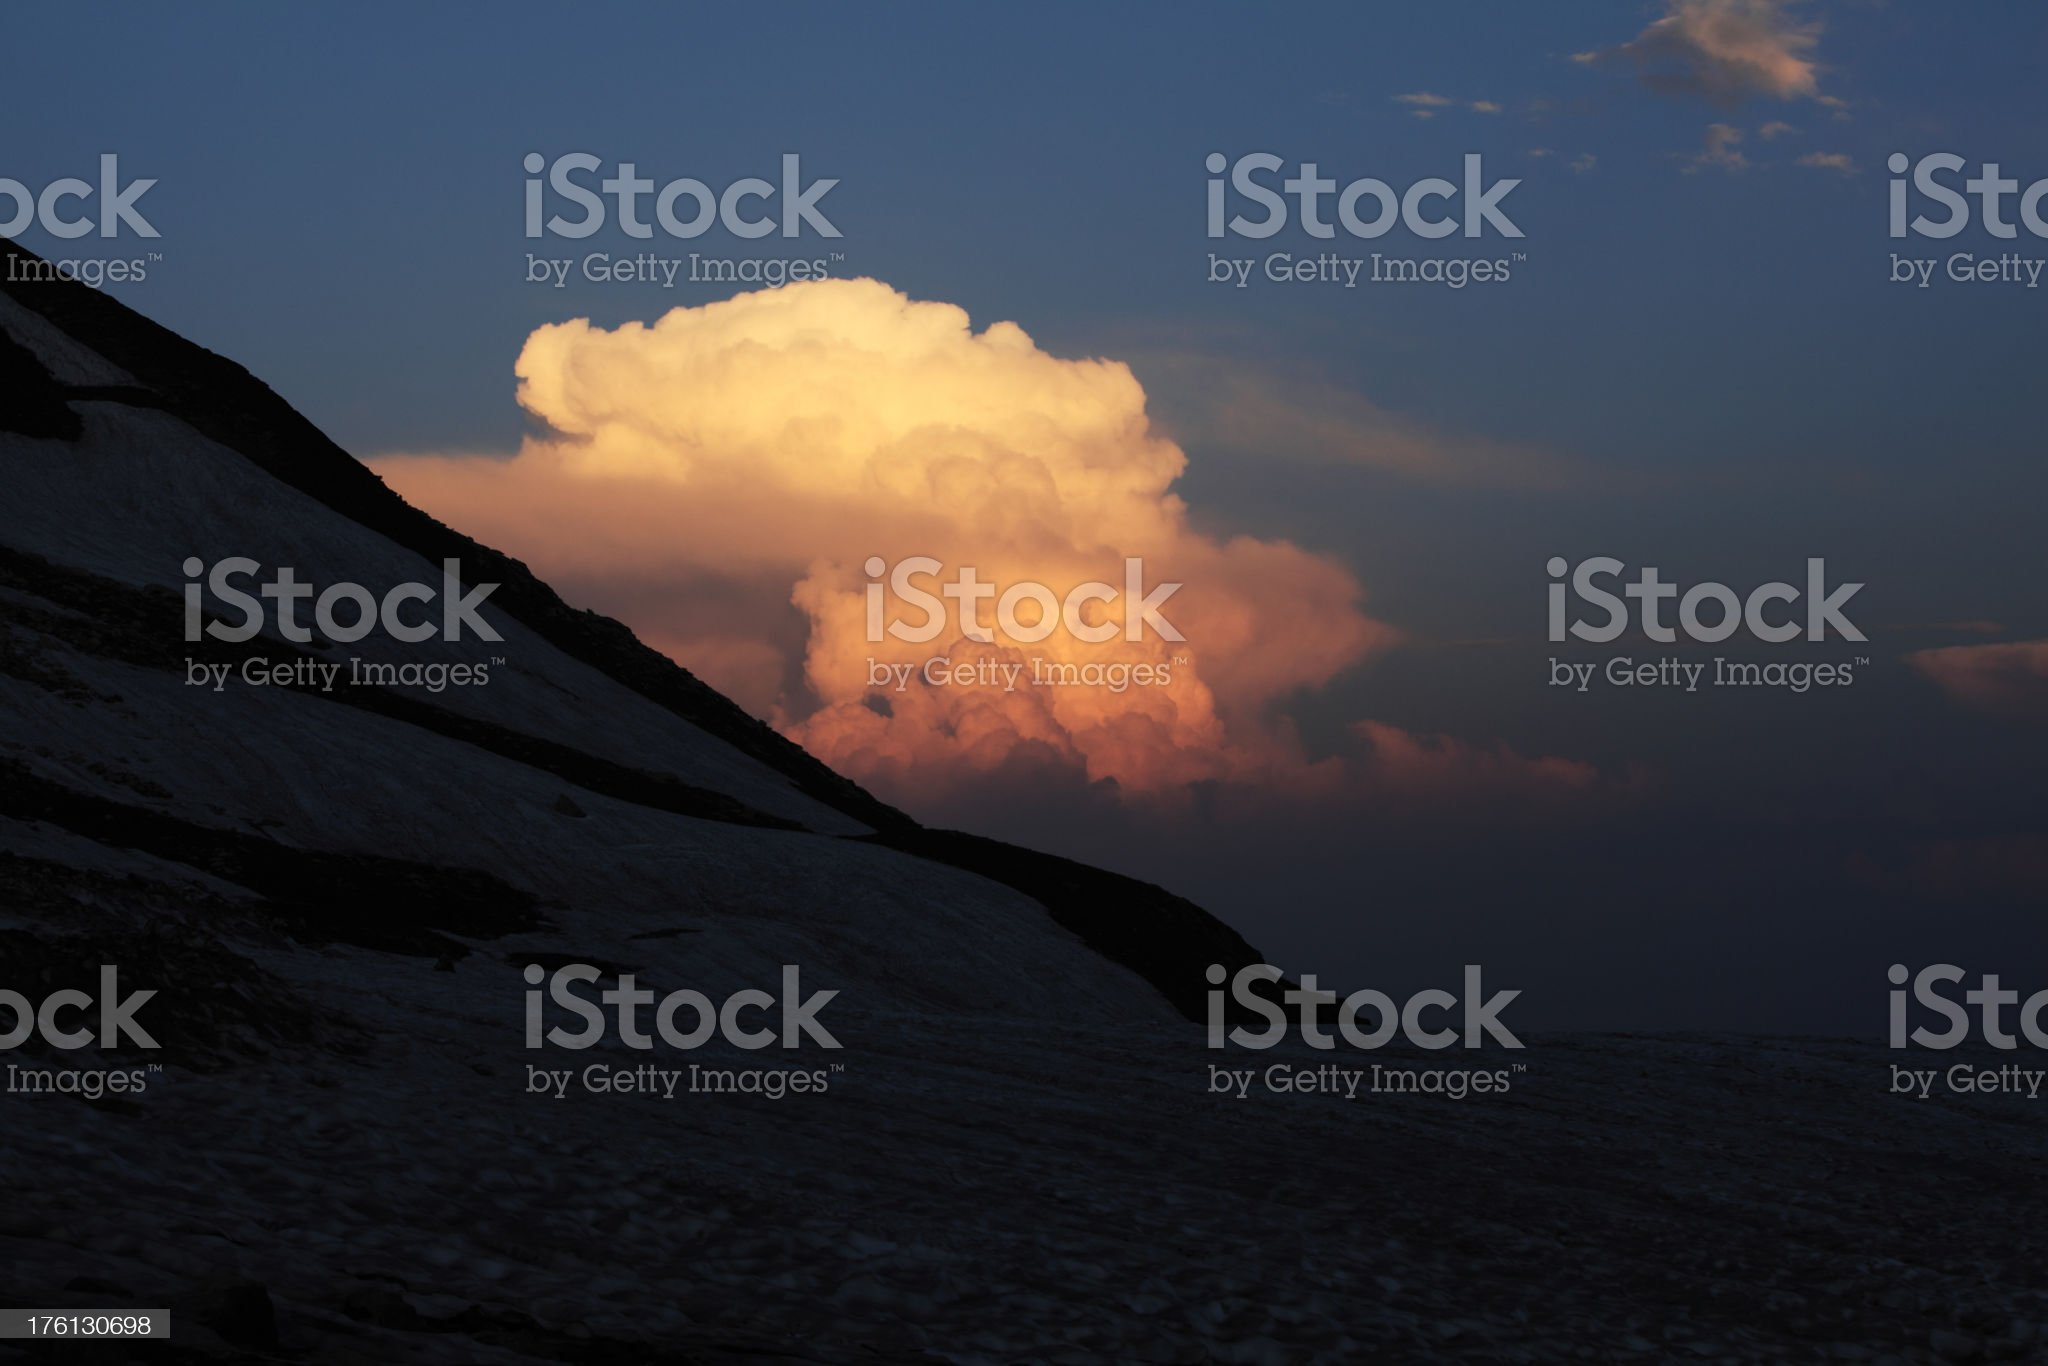 Twilight Sky royalty-free stock photo